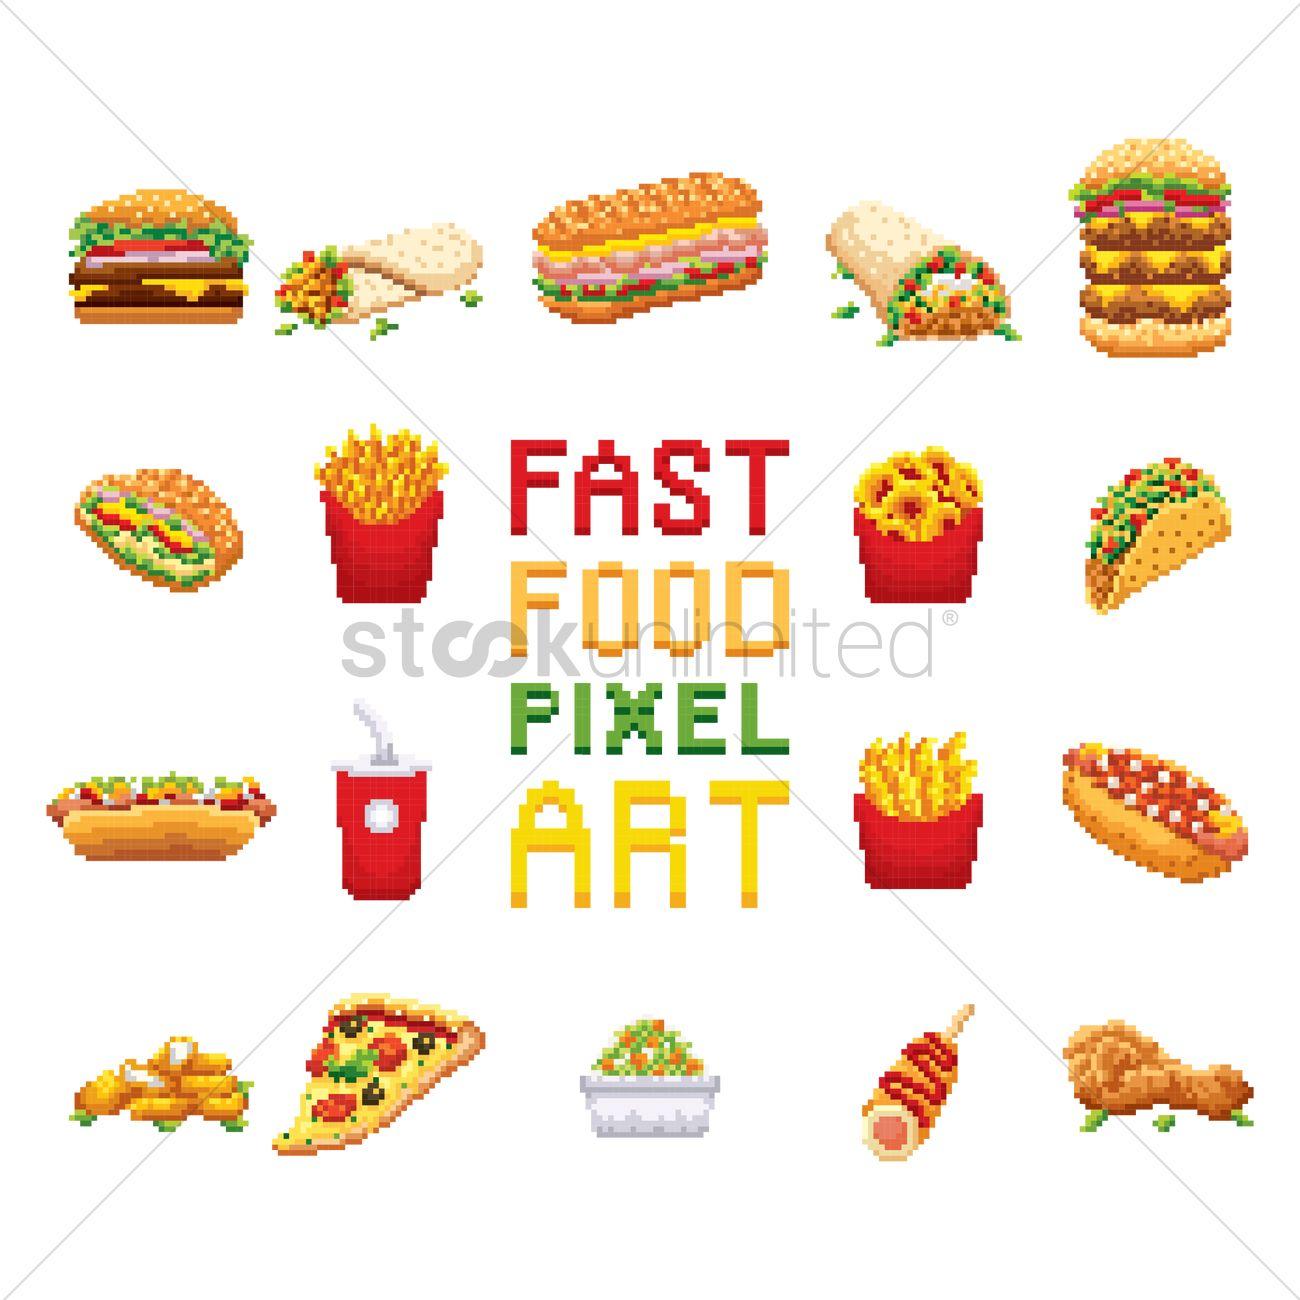 Fast Food In Cayman Islands